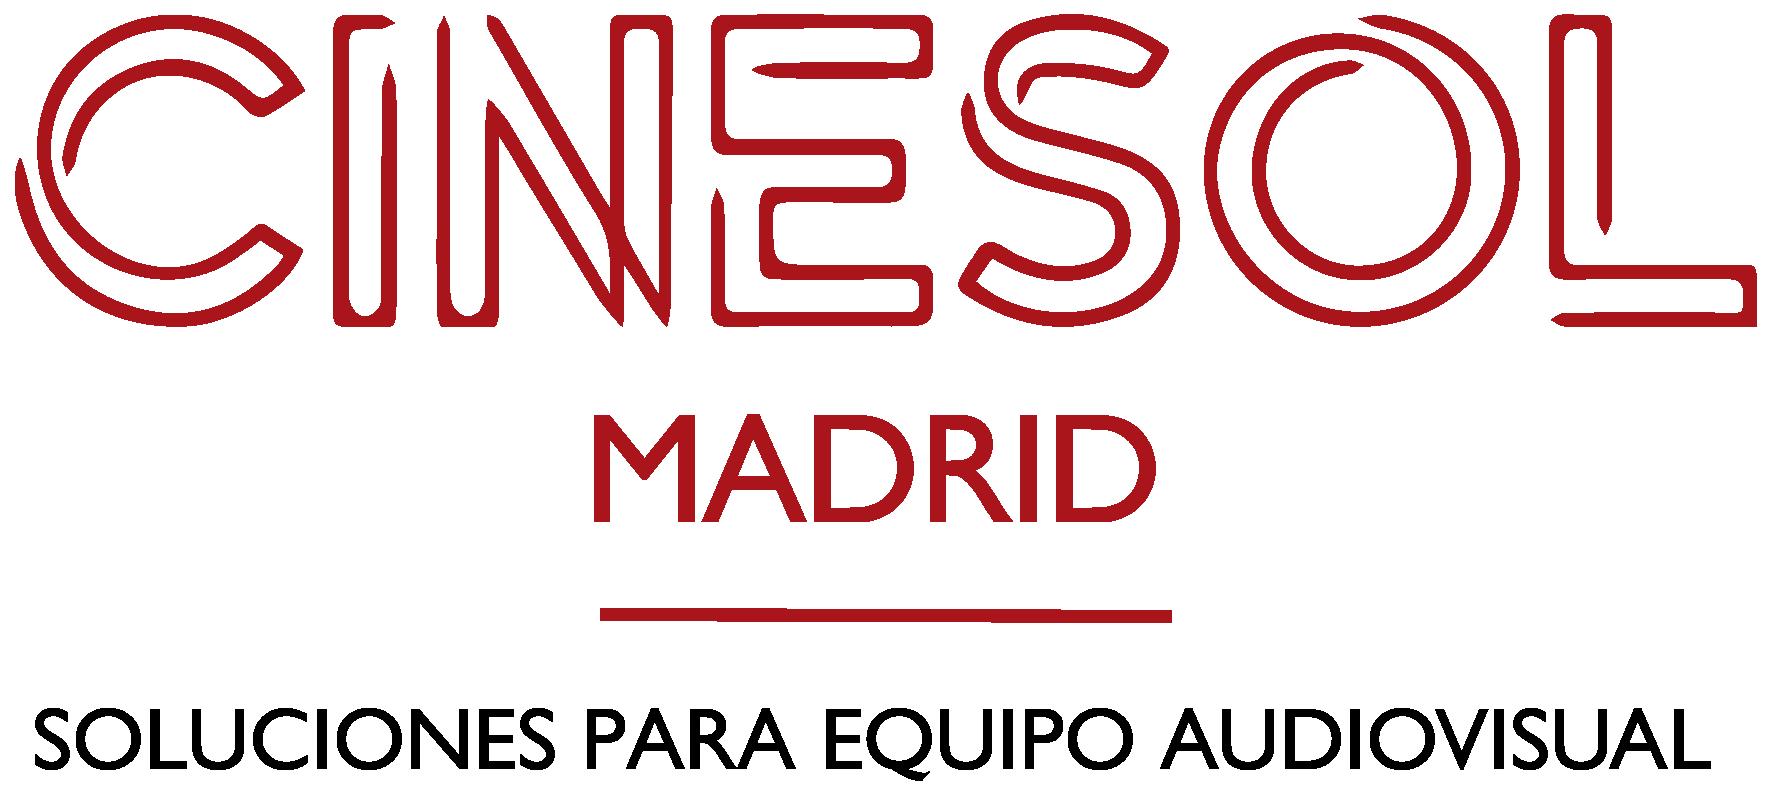 CINESOL MADRID logo